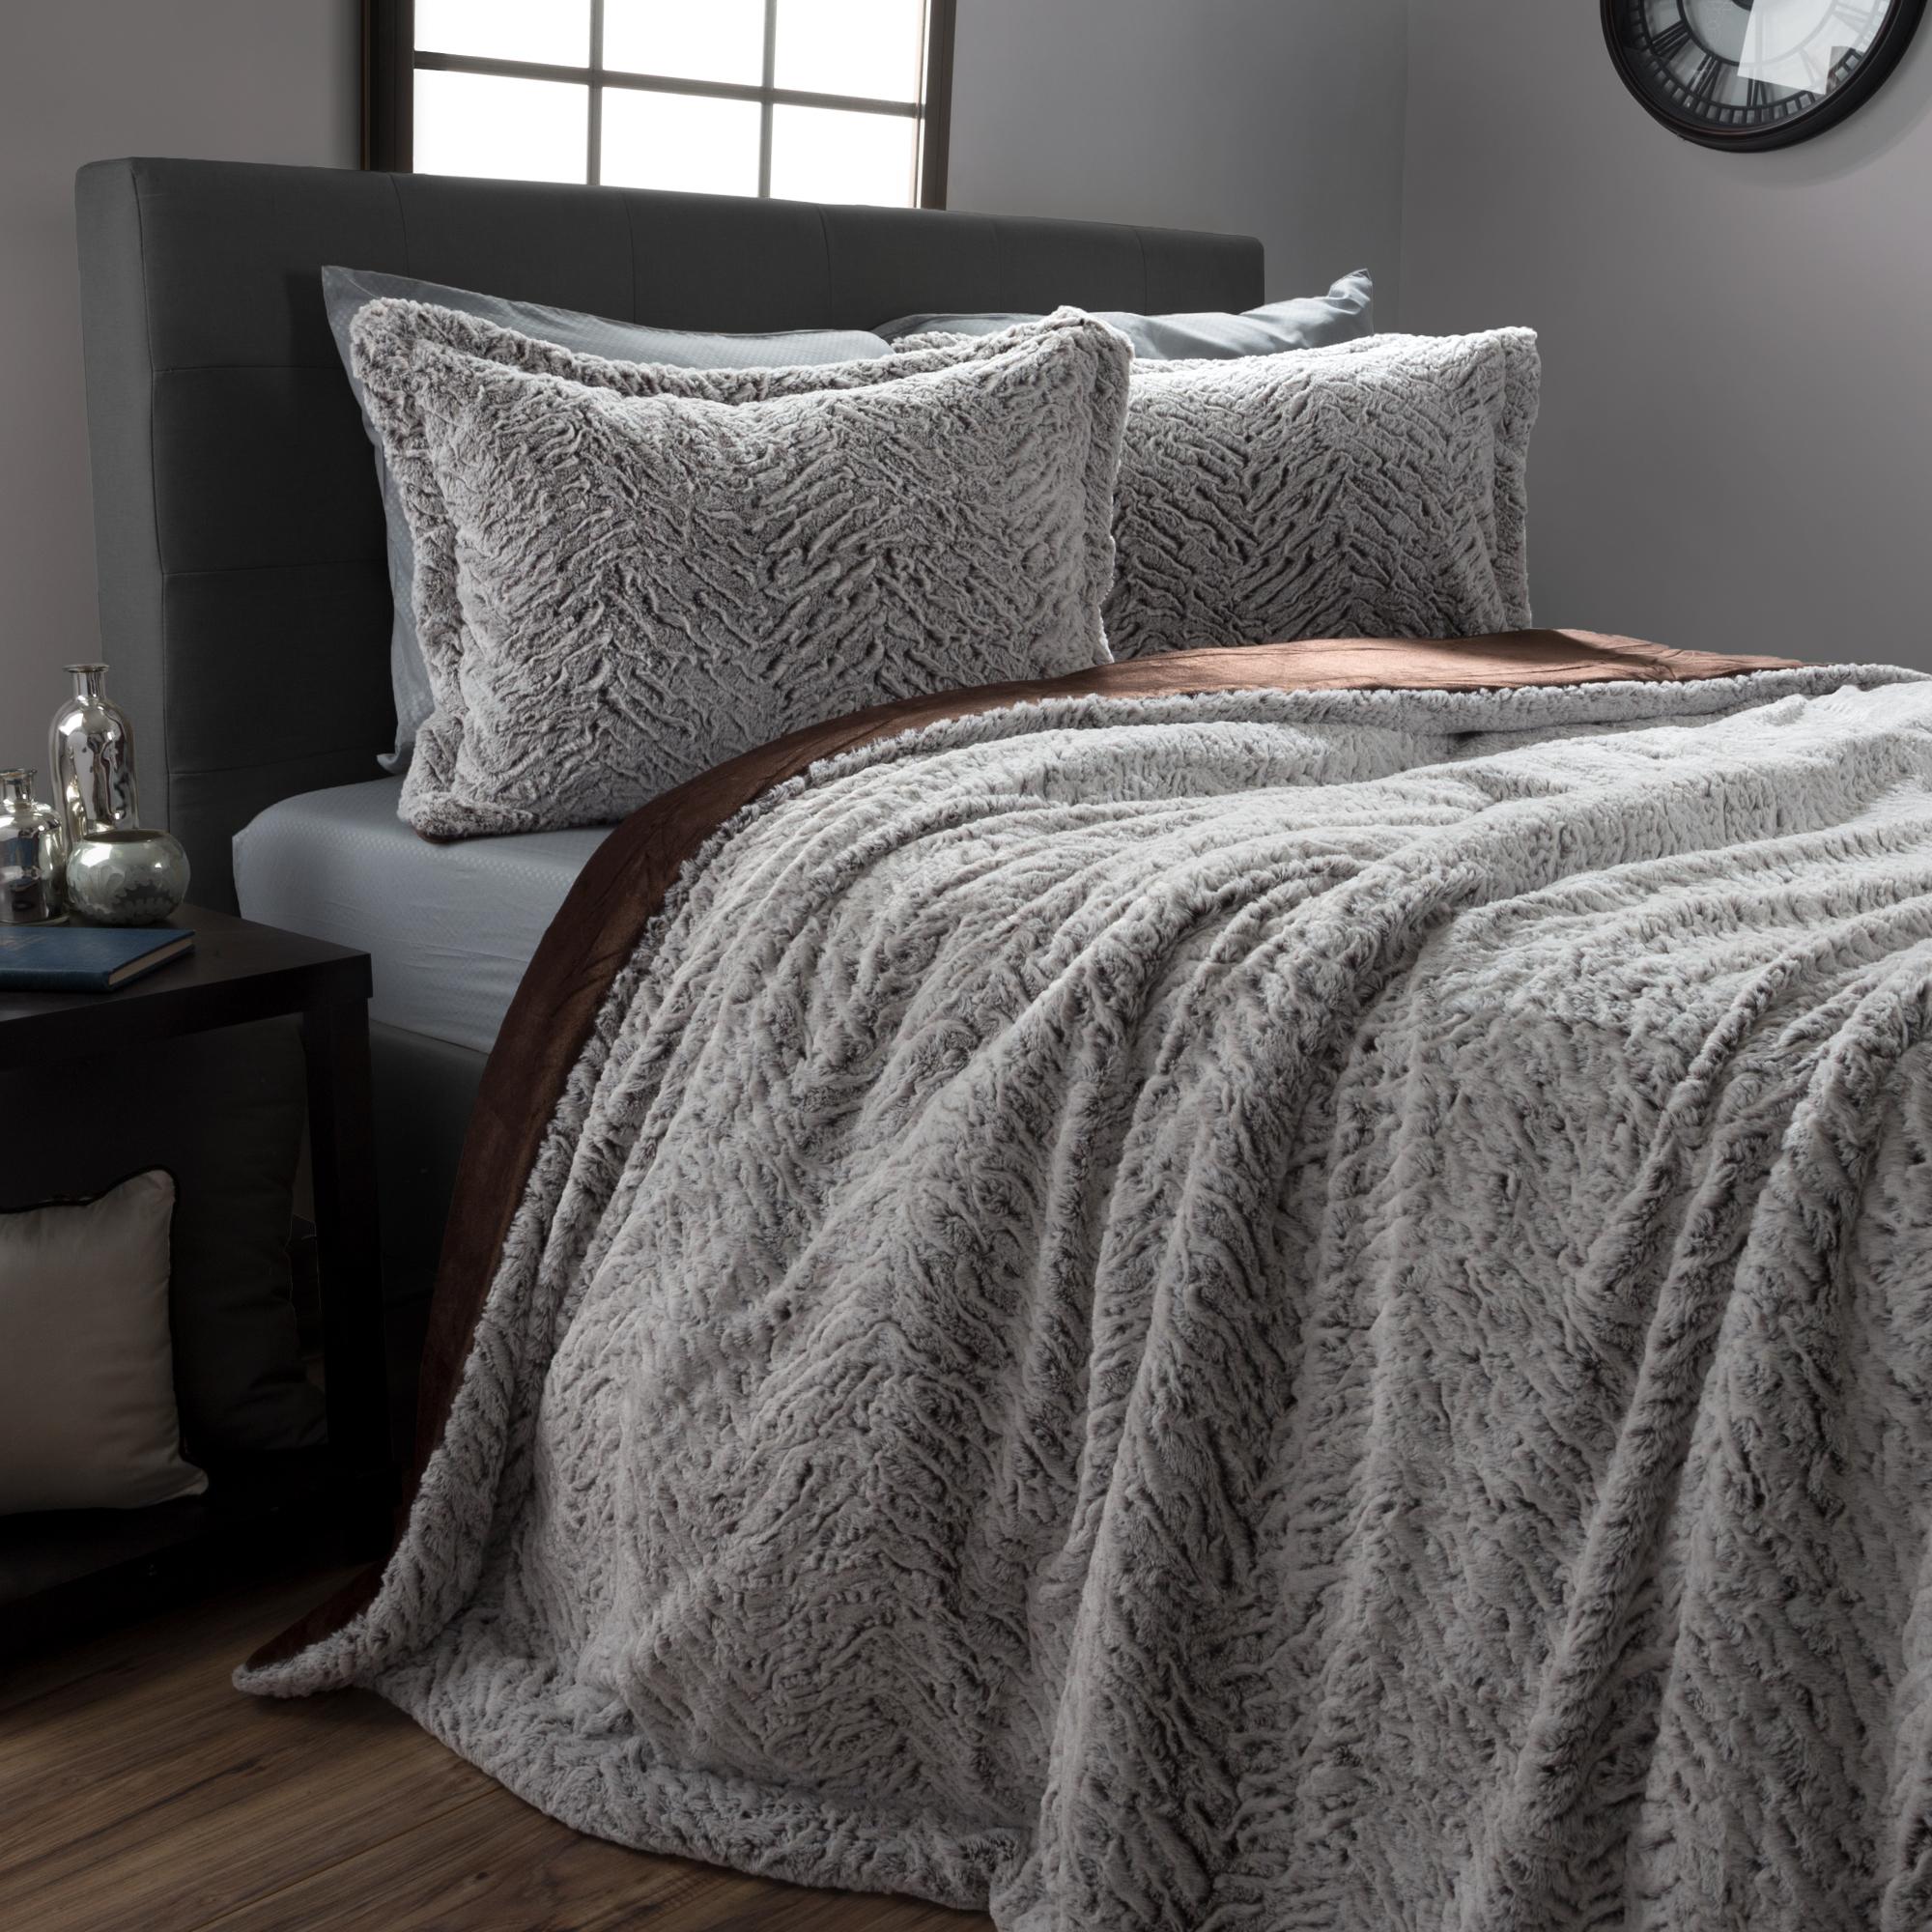 Faux Fur Comforter Set 3 Piece Fullqueen Comforter And Sham Set